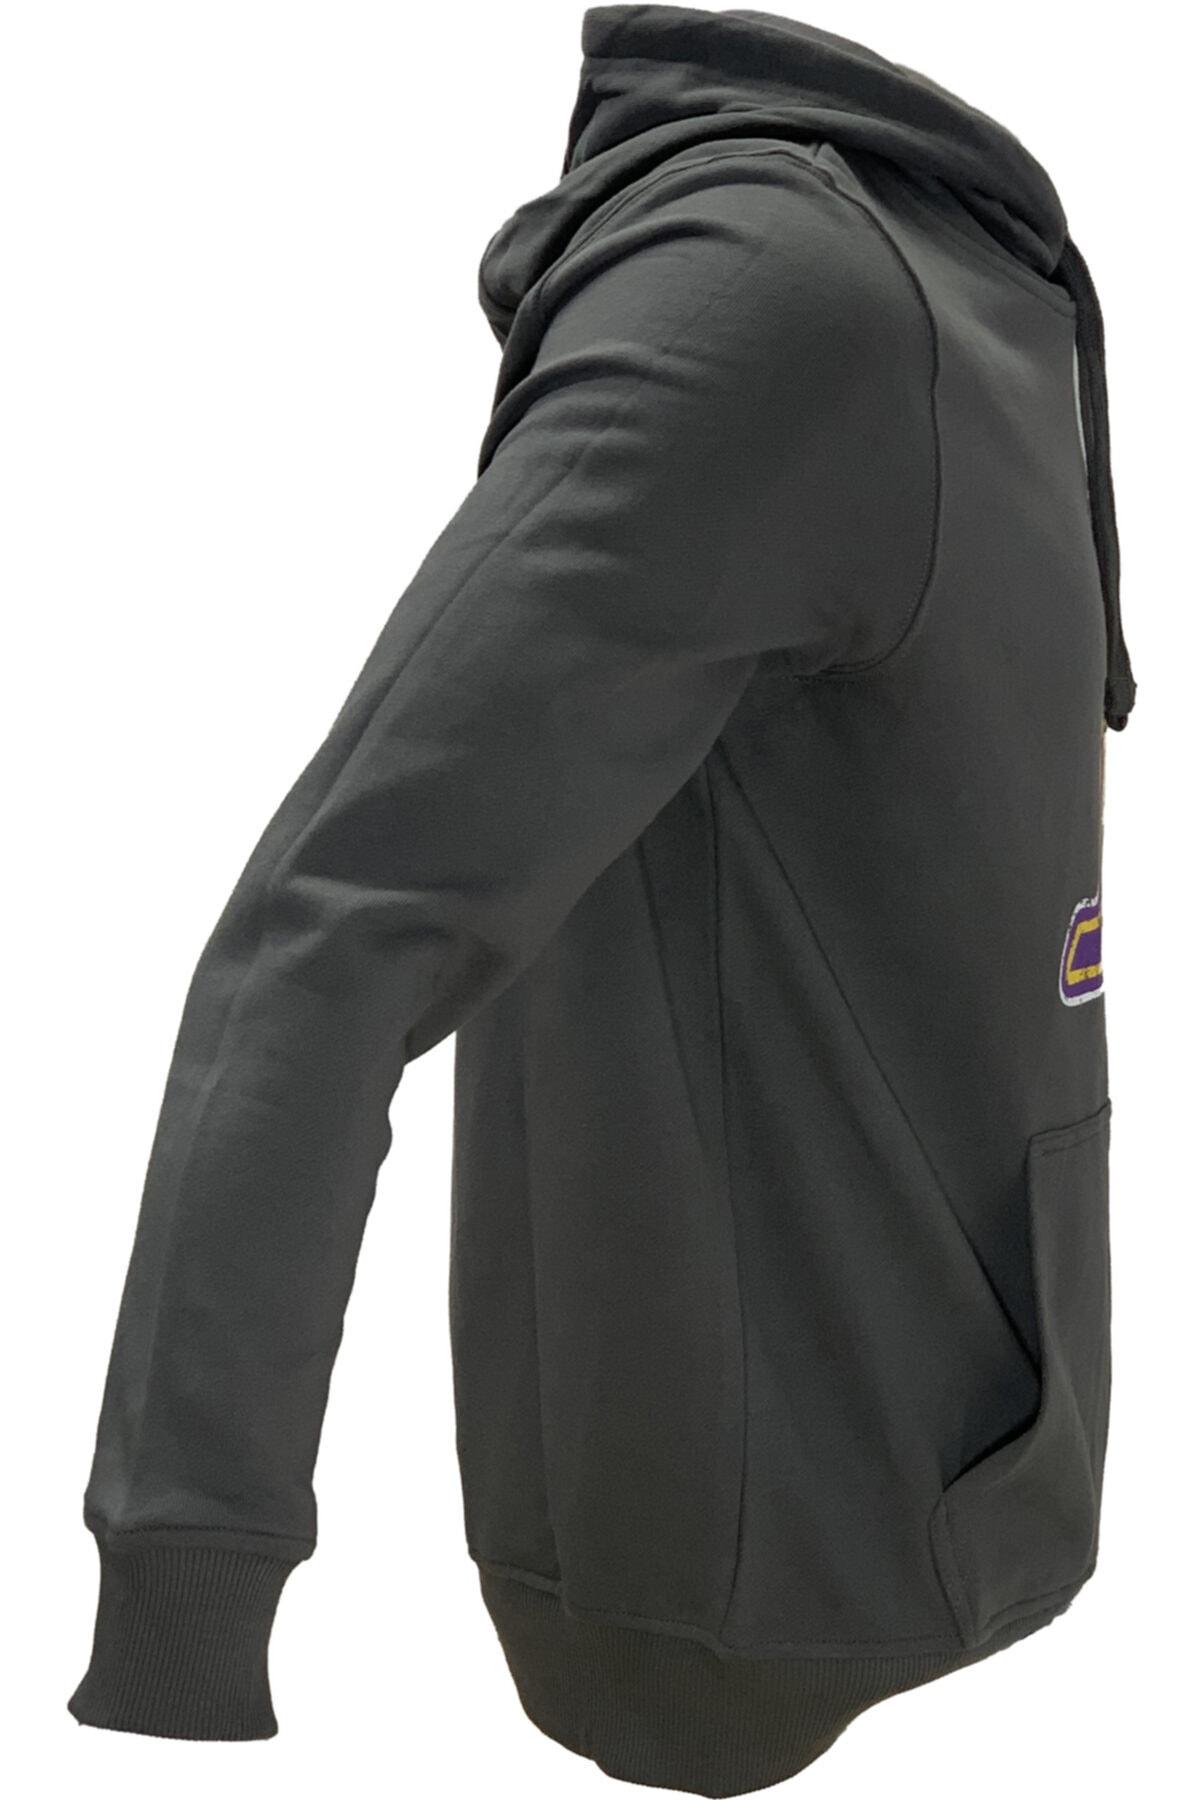 SPORTSACADEMY Unisex Siyah Basketbol Sweatshirt 2